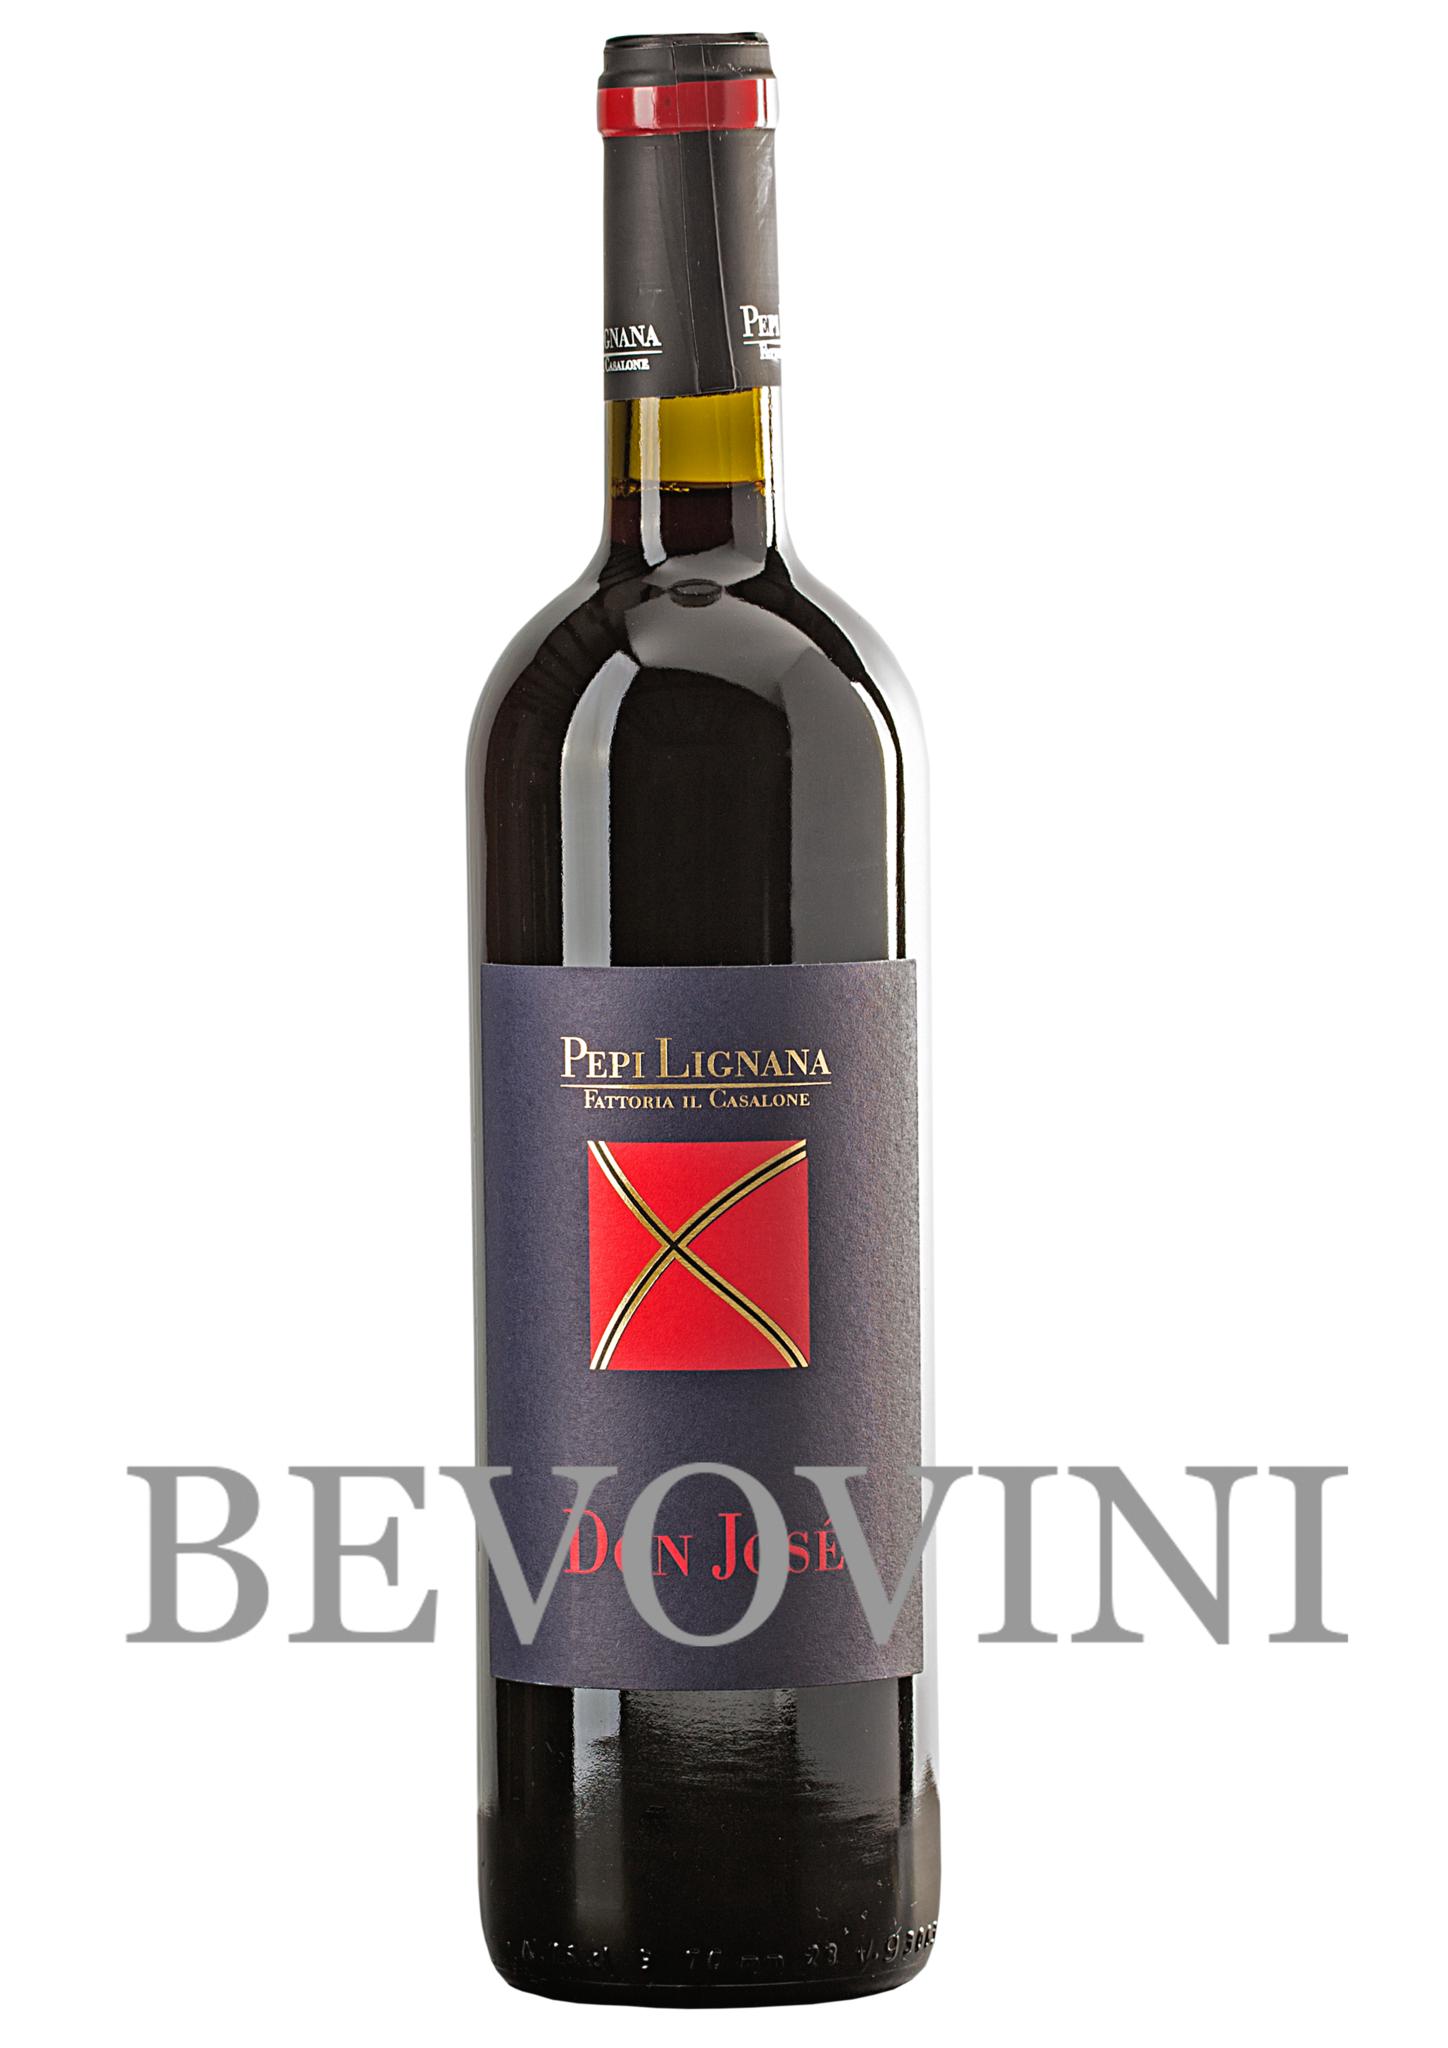 Pepi Lignana - Fattoria Il Casalone Maremma Toscana Doc - Cabernet Franc - Don José 2016